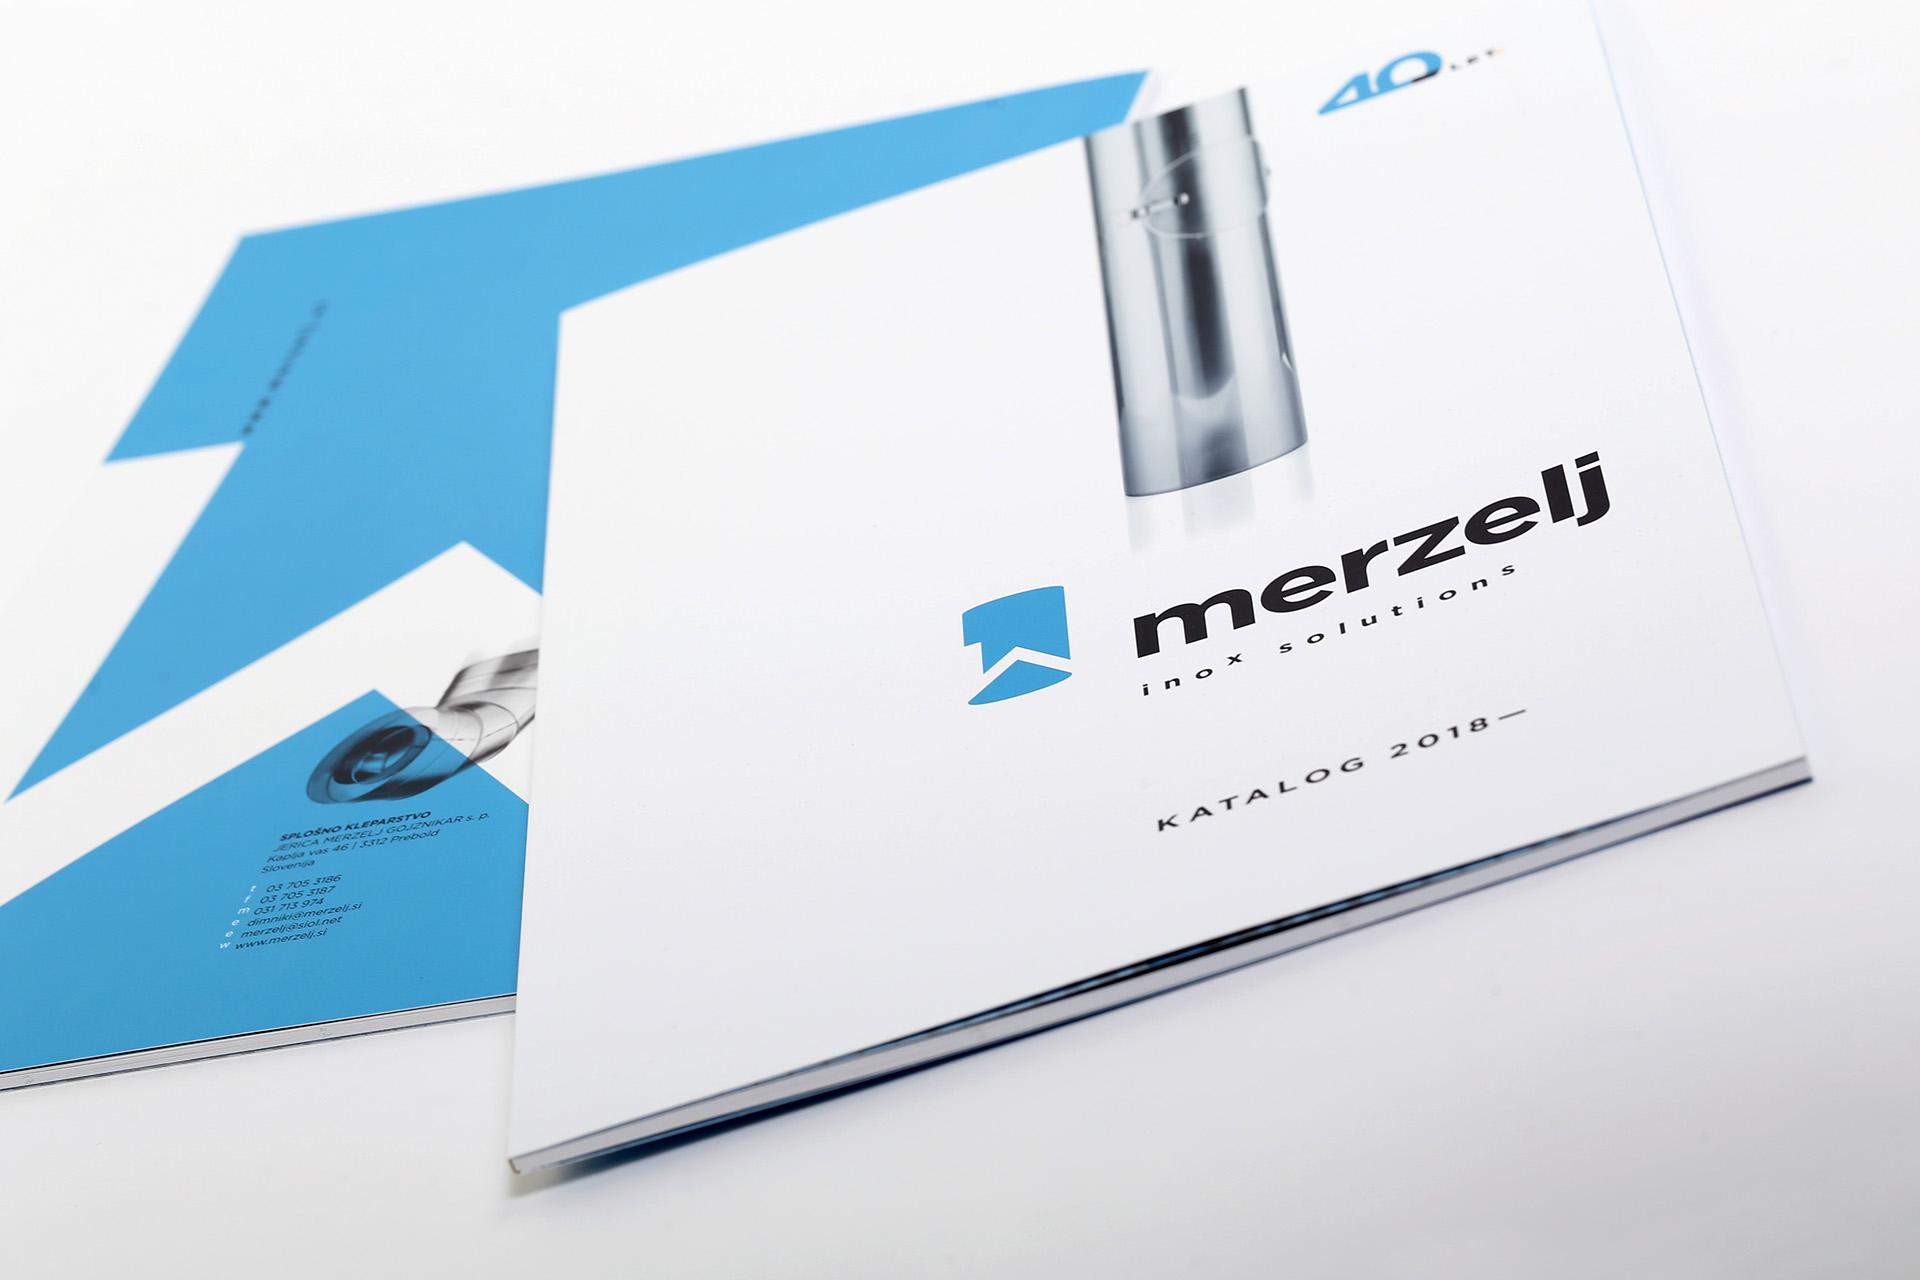 merzelj_vizualna_marko_marinsek_ma-ma_studio_katalog4